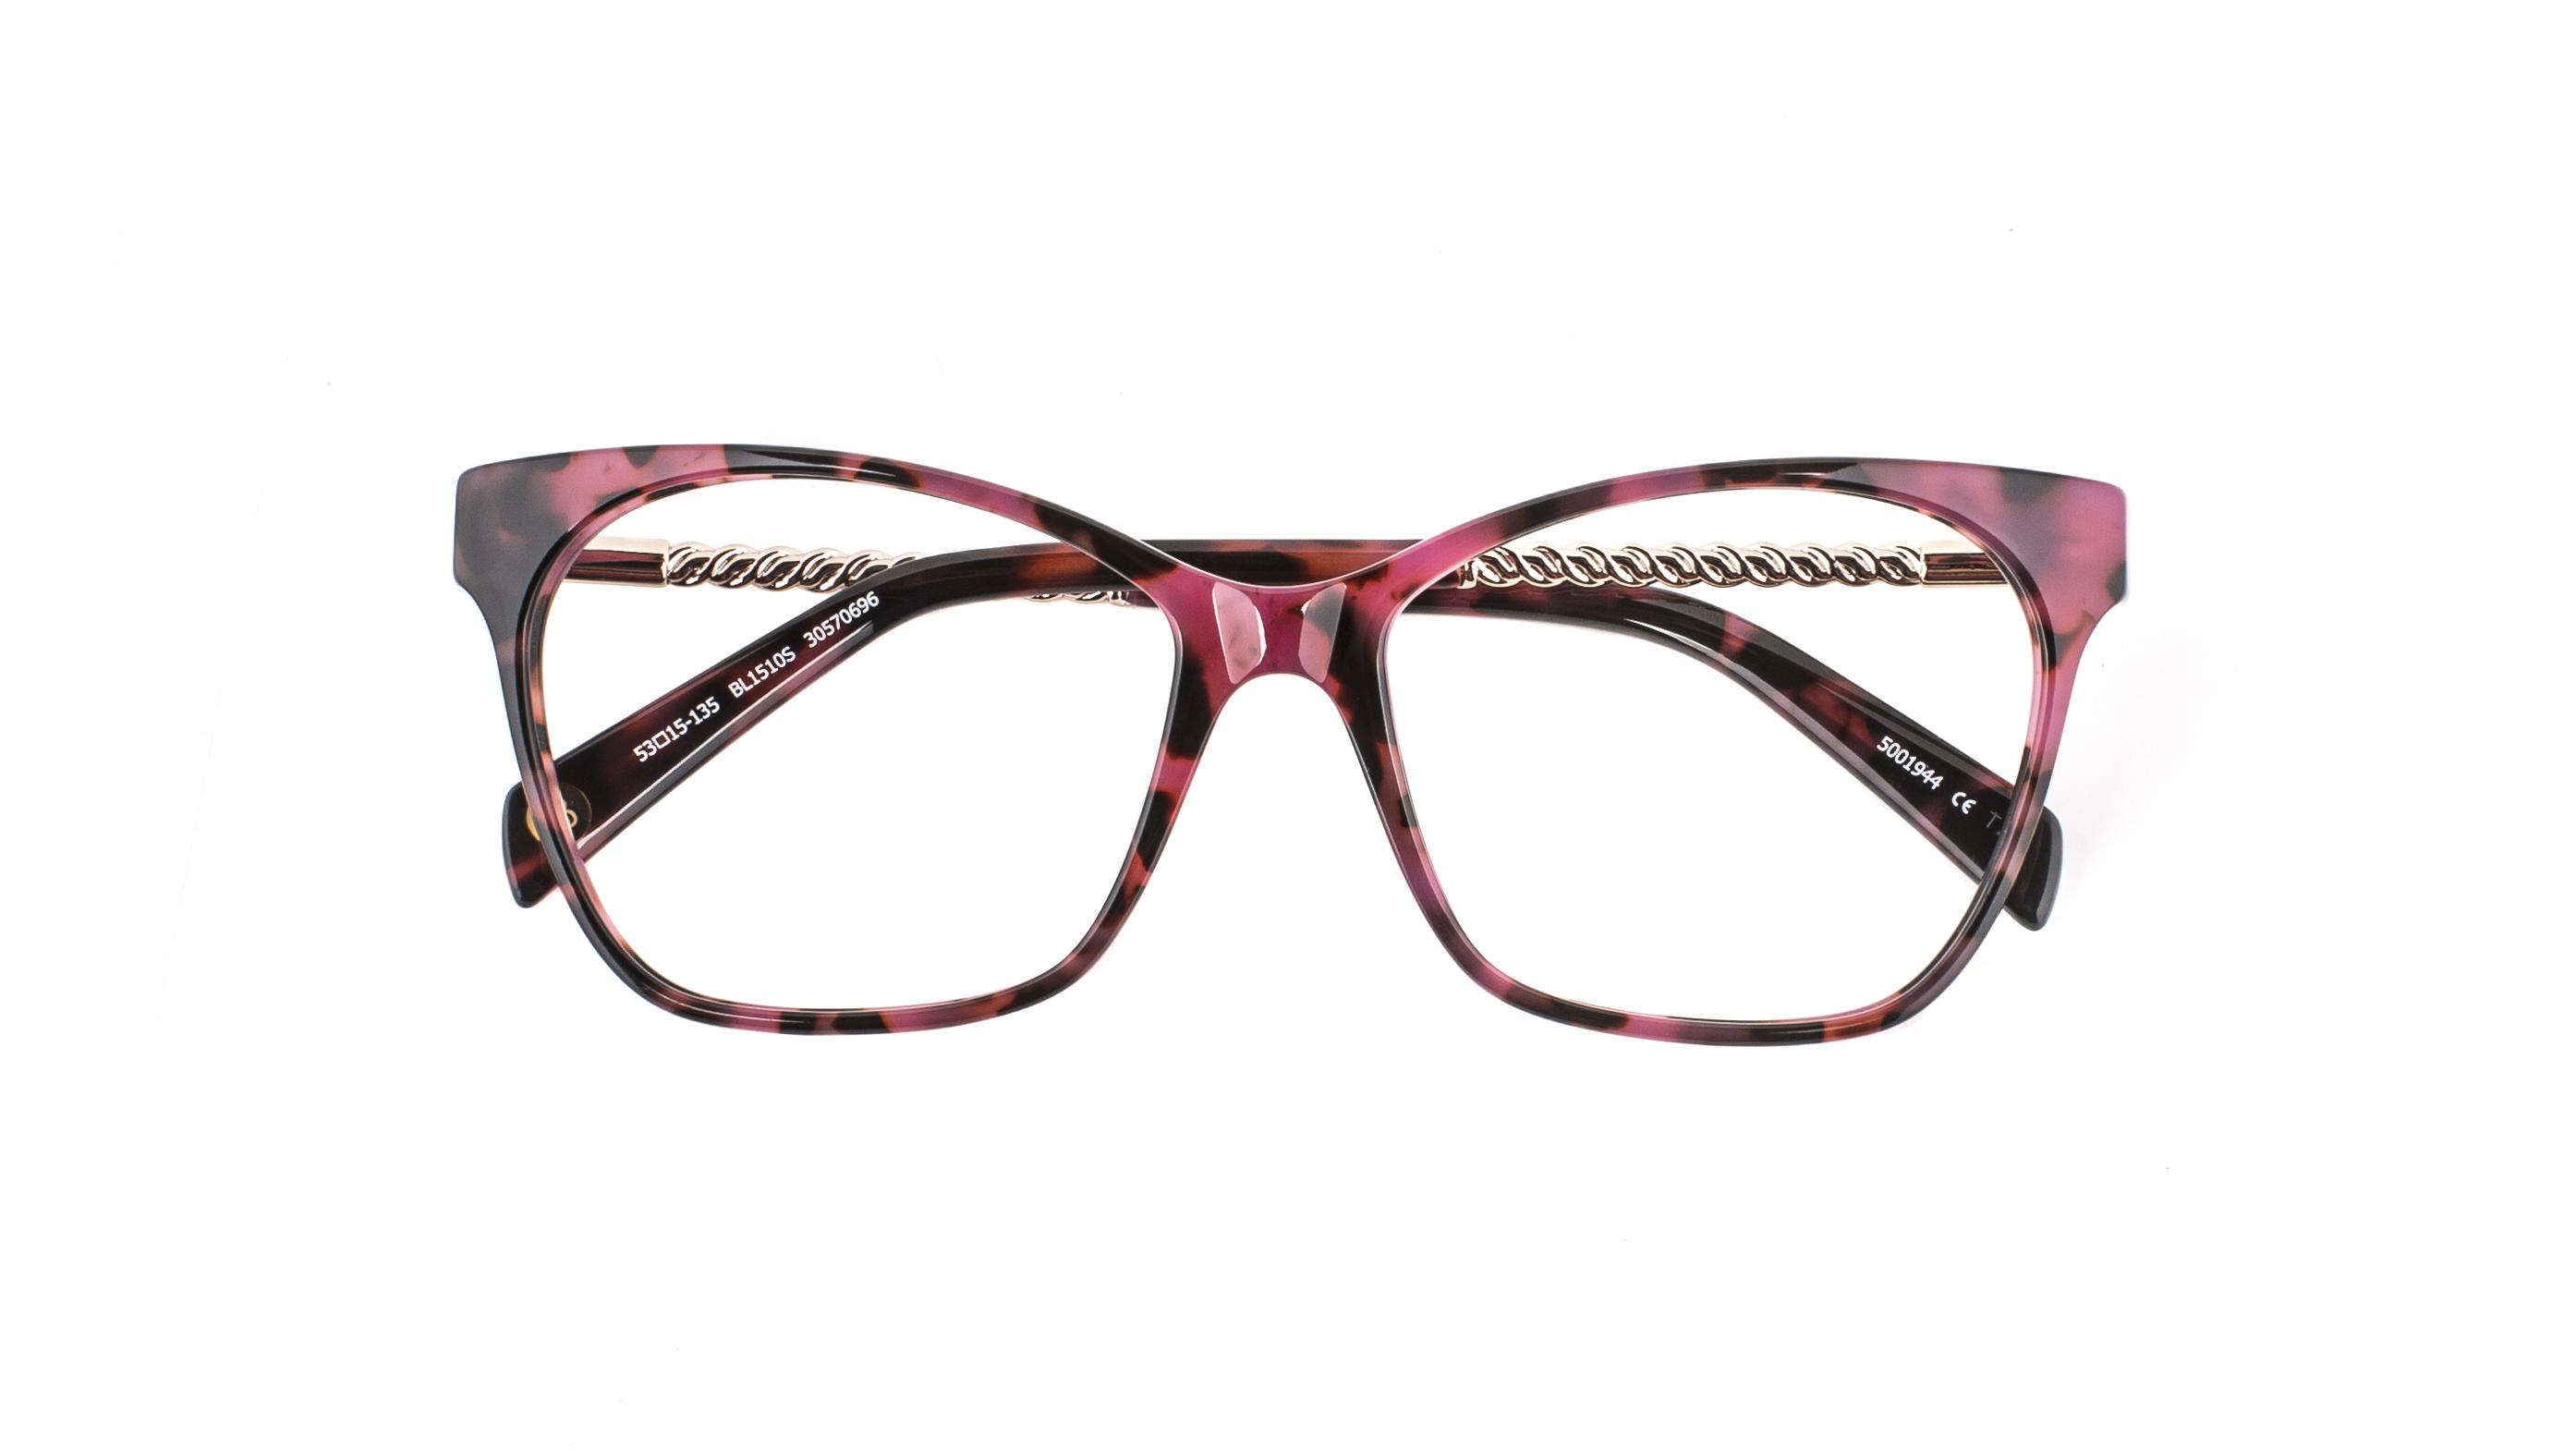 Balmain x Specsavers BL1510S 30570696 - RRP 2 pairs single vision $459 (2)